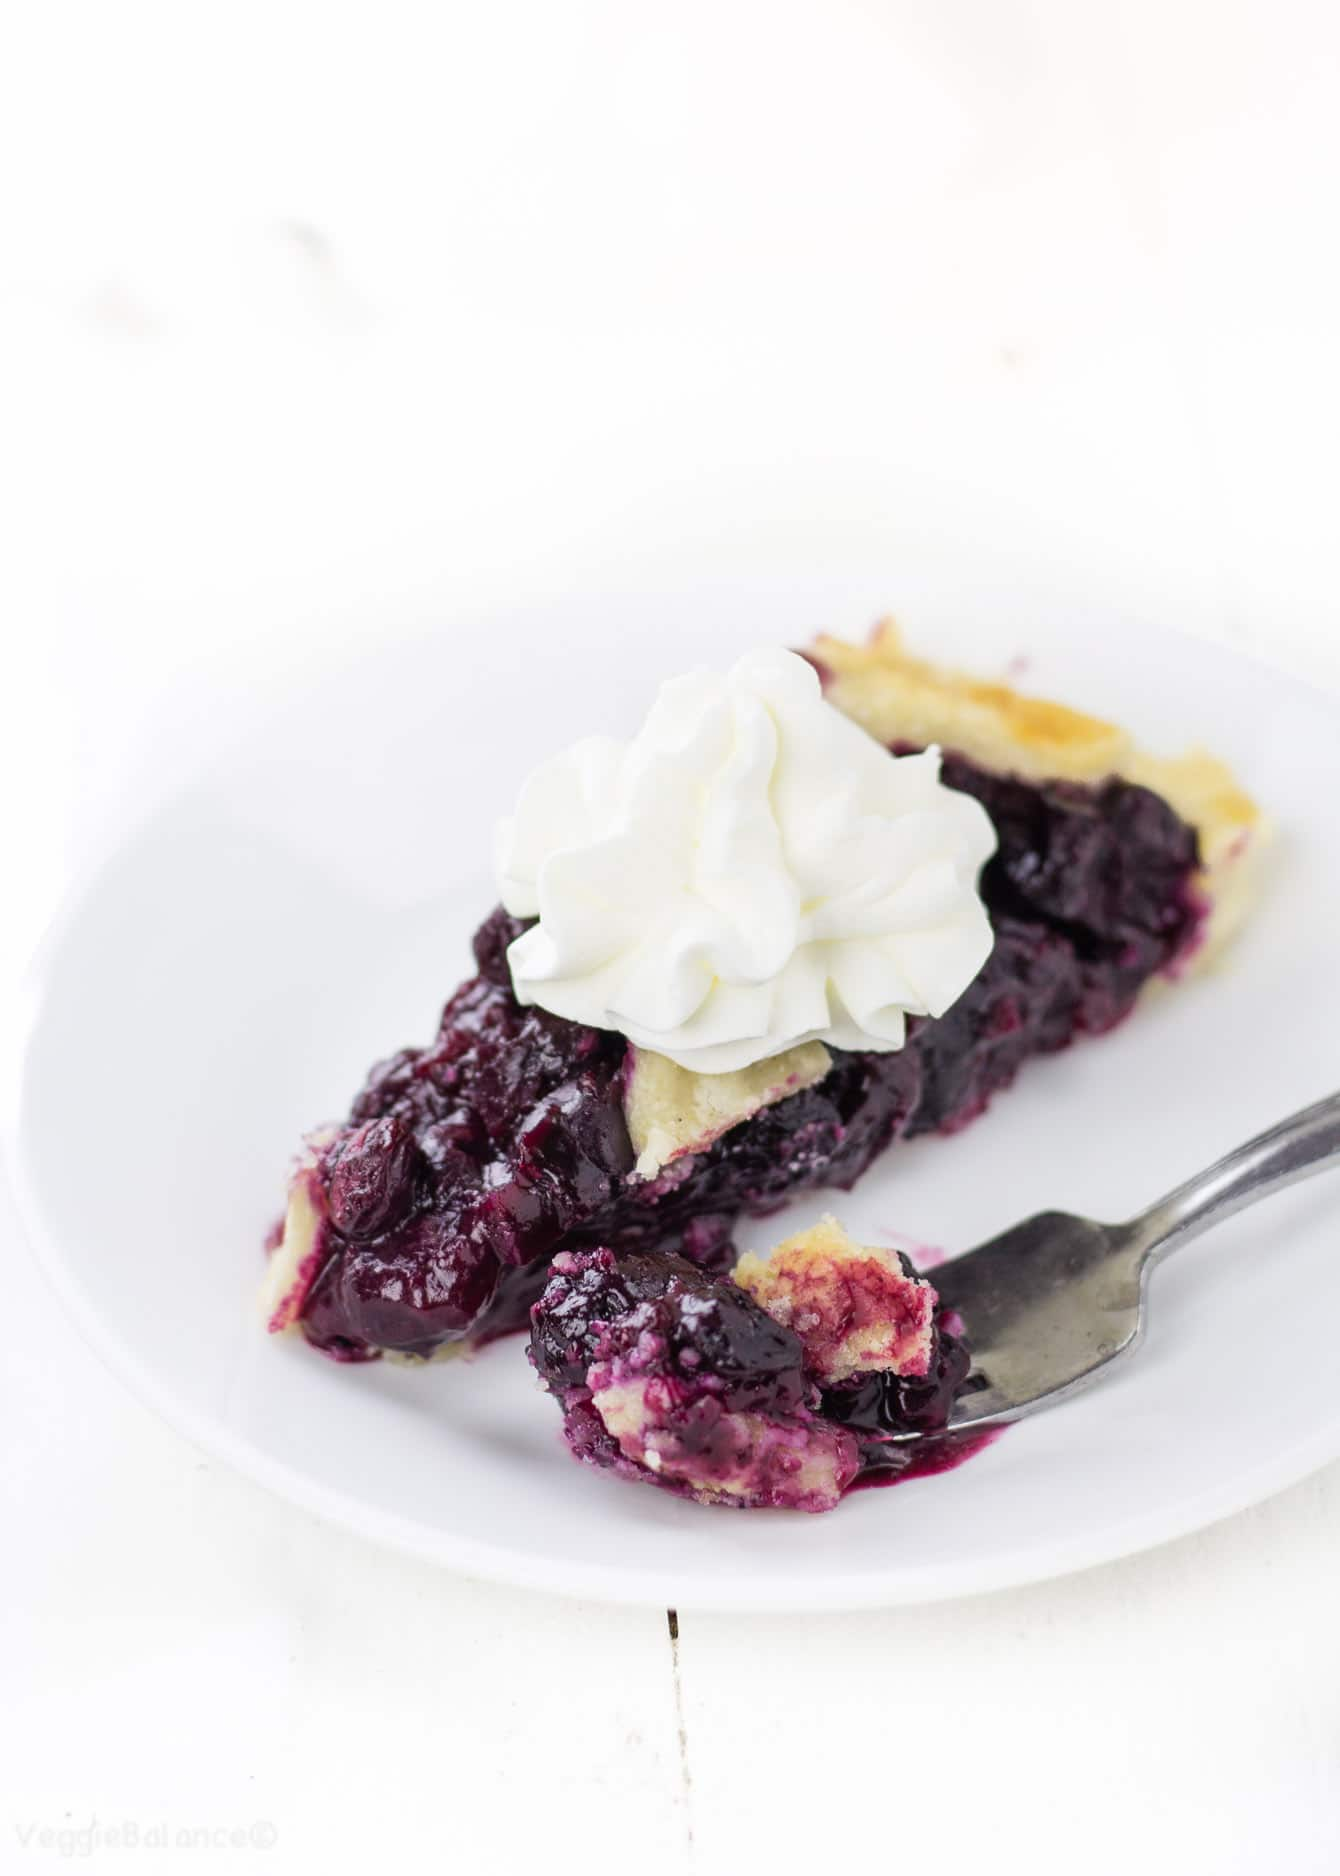 Gluten Free Pie Crust recipe with a Perfect Blueberry Filling - Veggiebalance.com